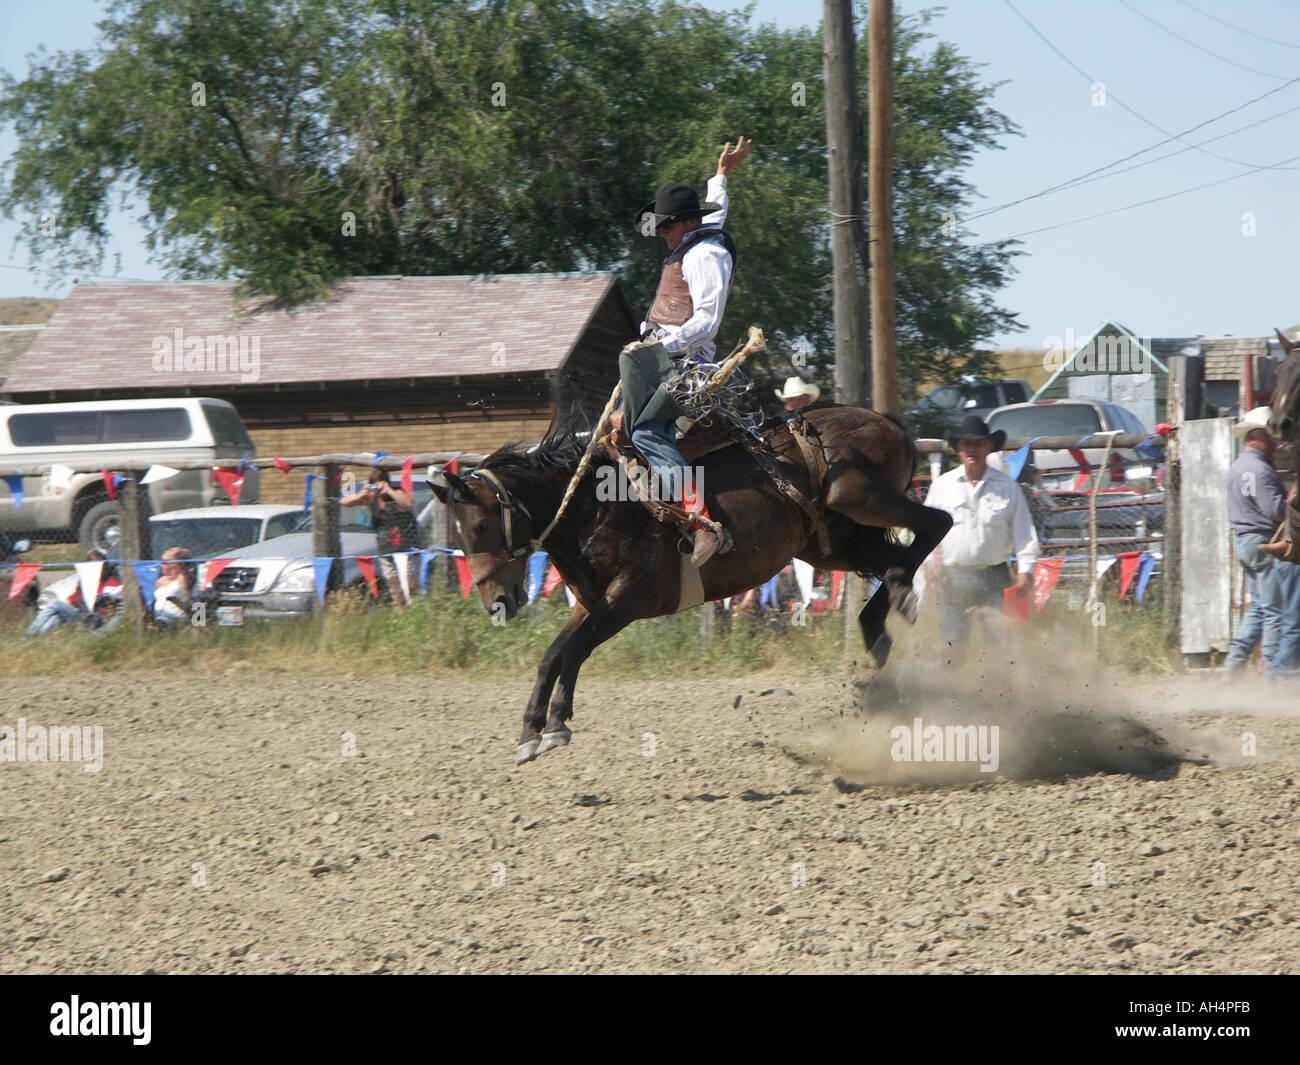 Bucking Bronco - Stock Image